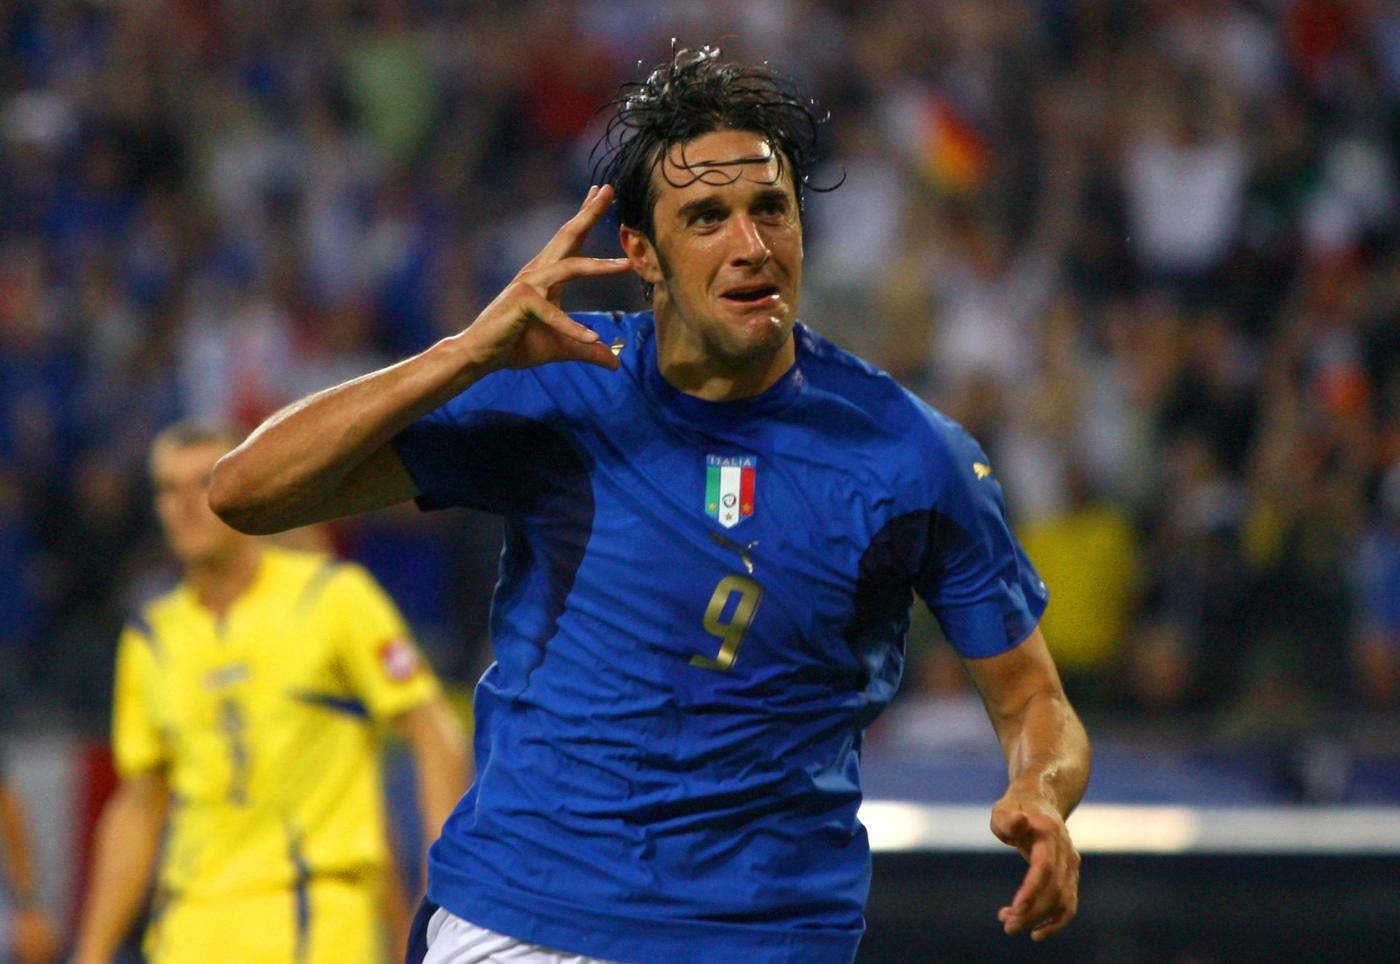 Luca Toni Italia-Ucraina 3-0 Mondiali 2006